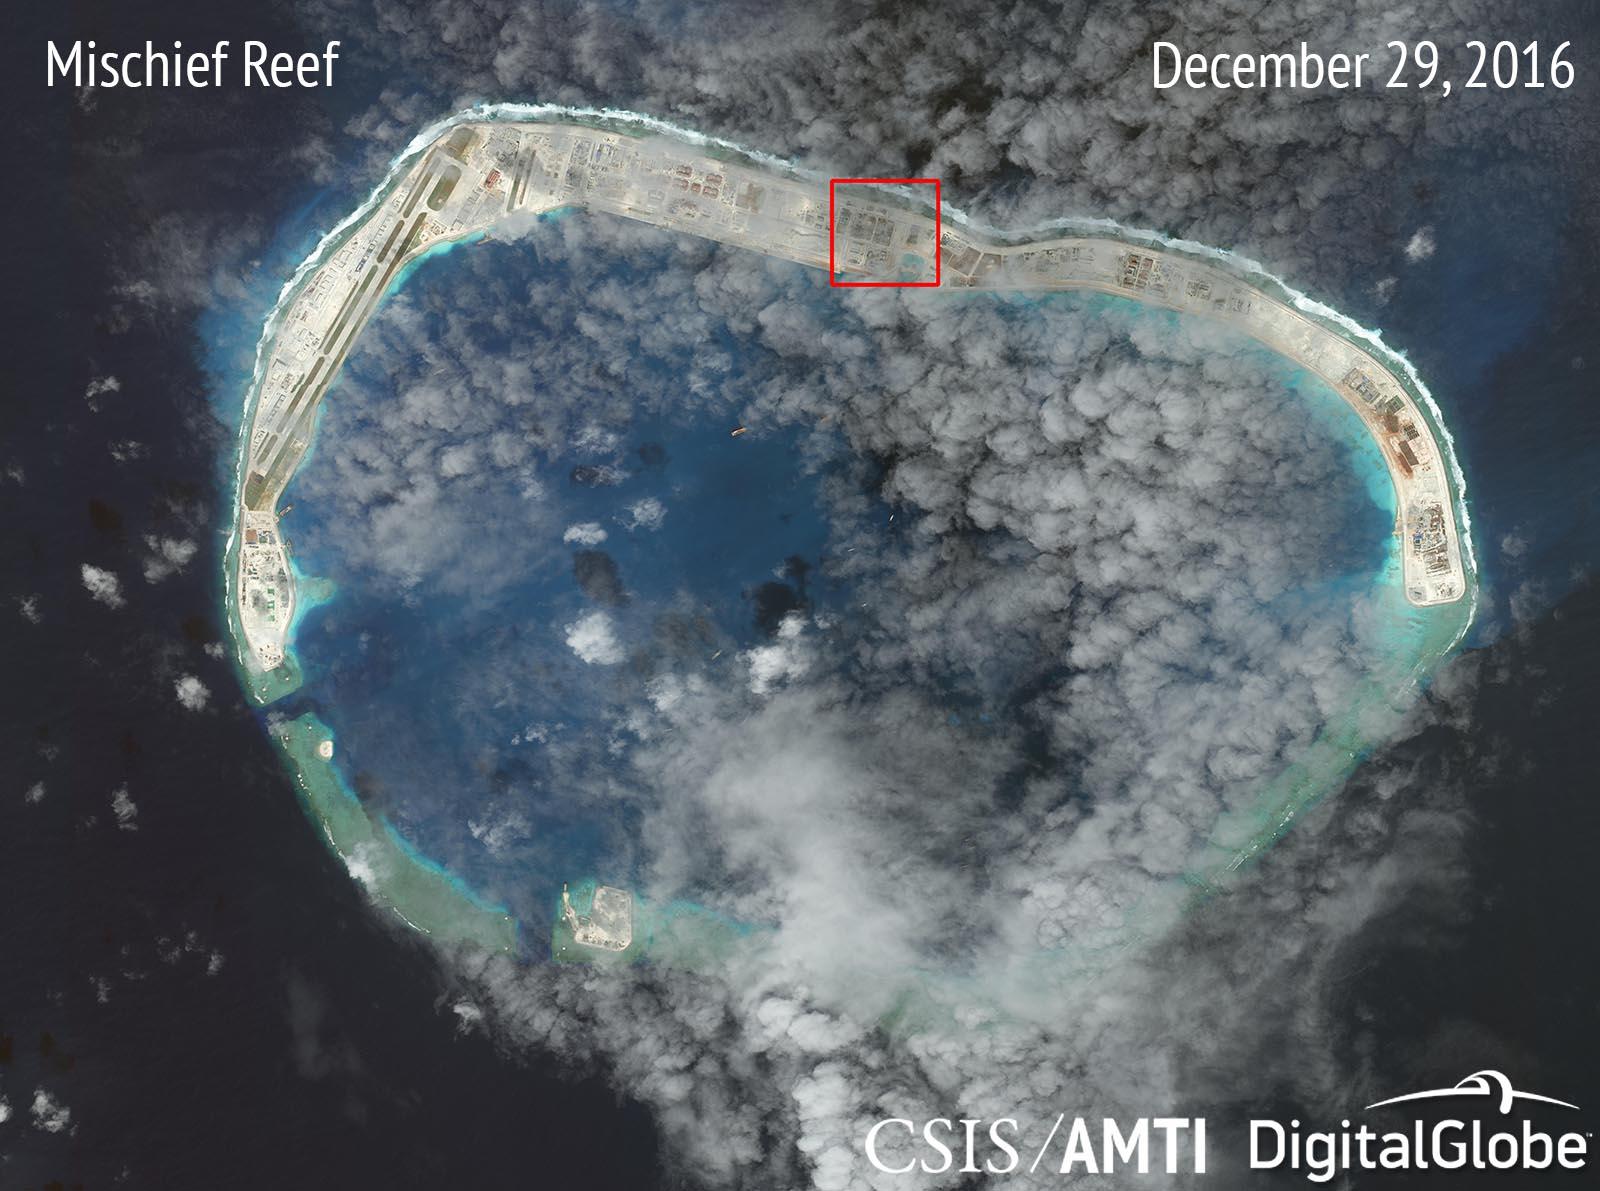 Mischief Reef New Large 12.29.16